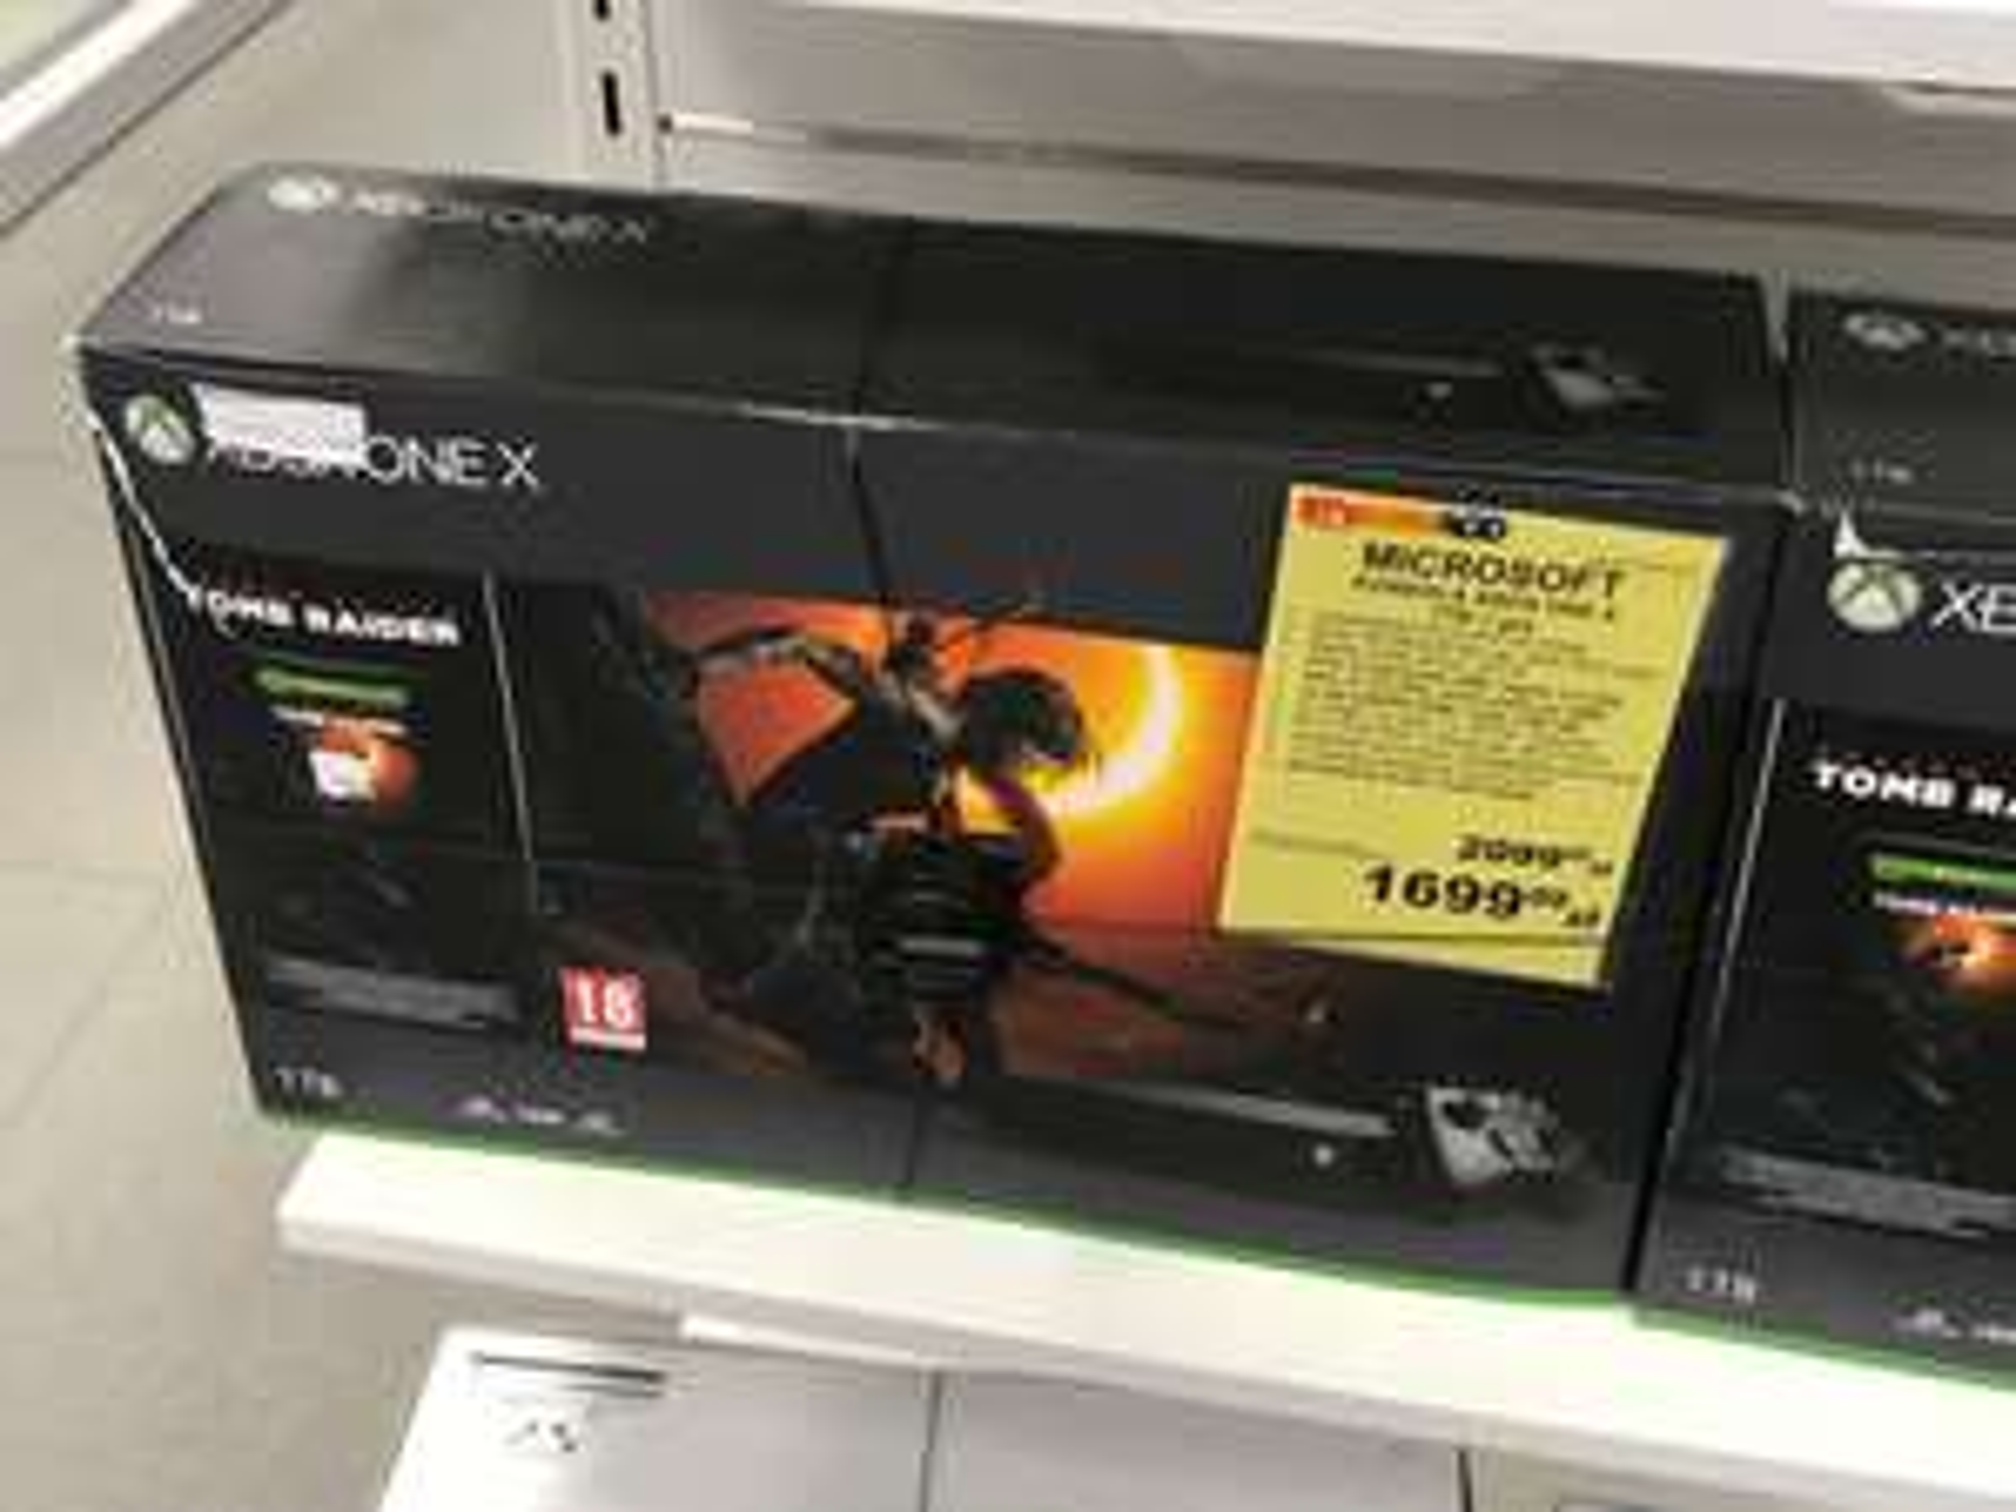 RTVeuroAGD Xbox One X + Shadow Of The Tomb Raider. |Jaworzno